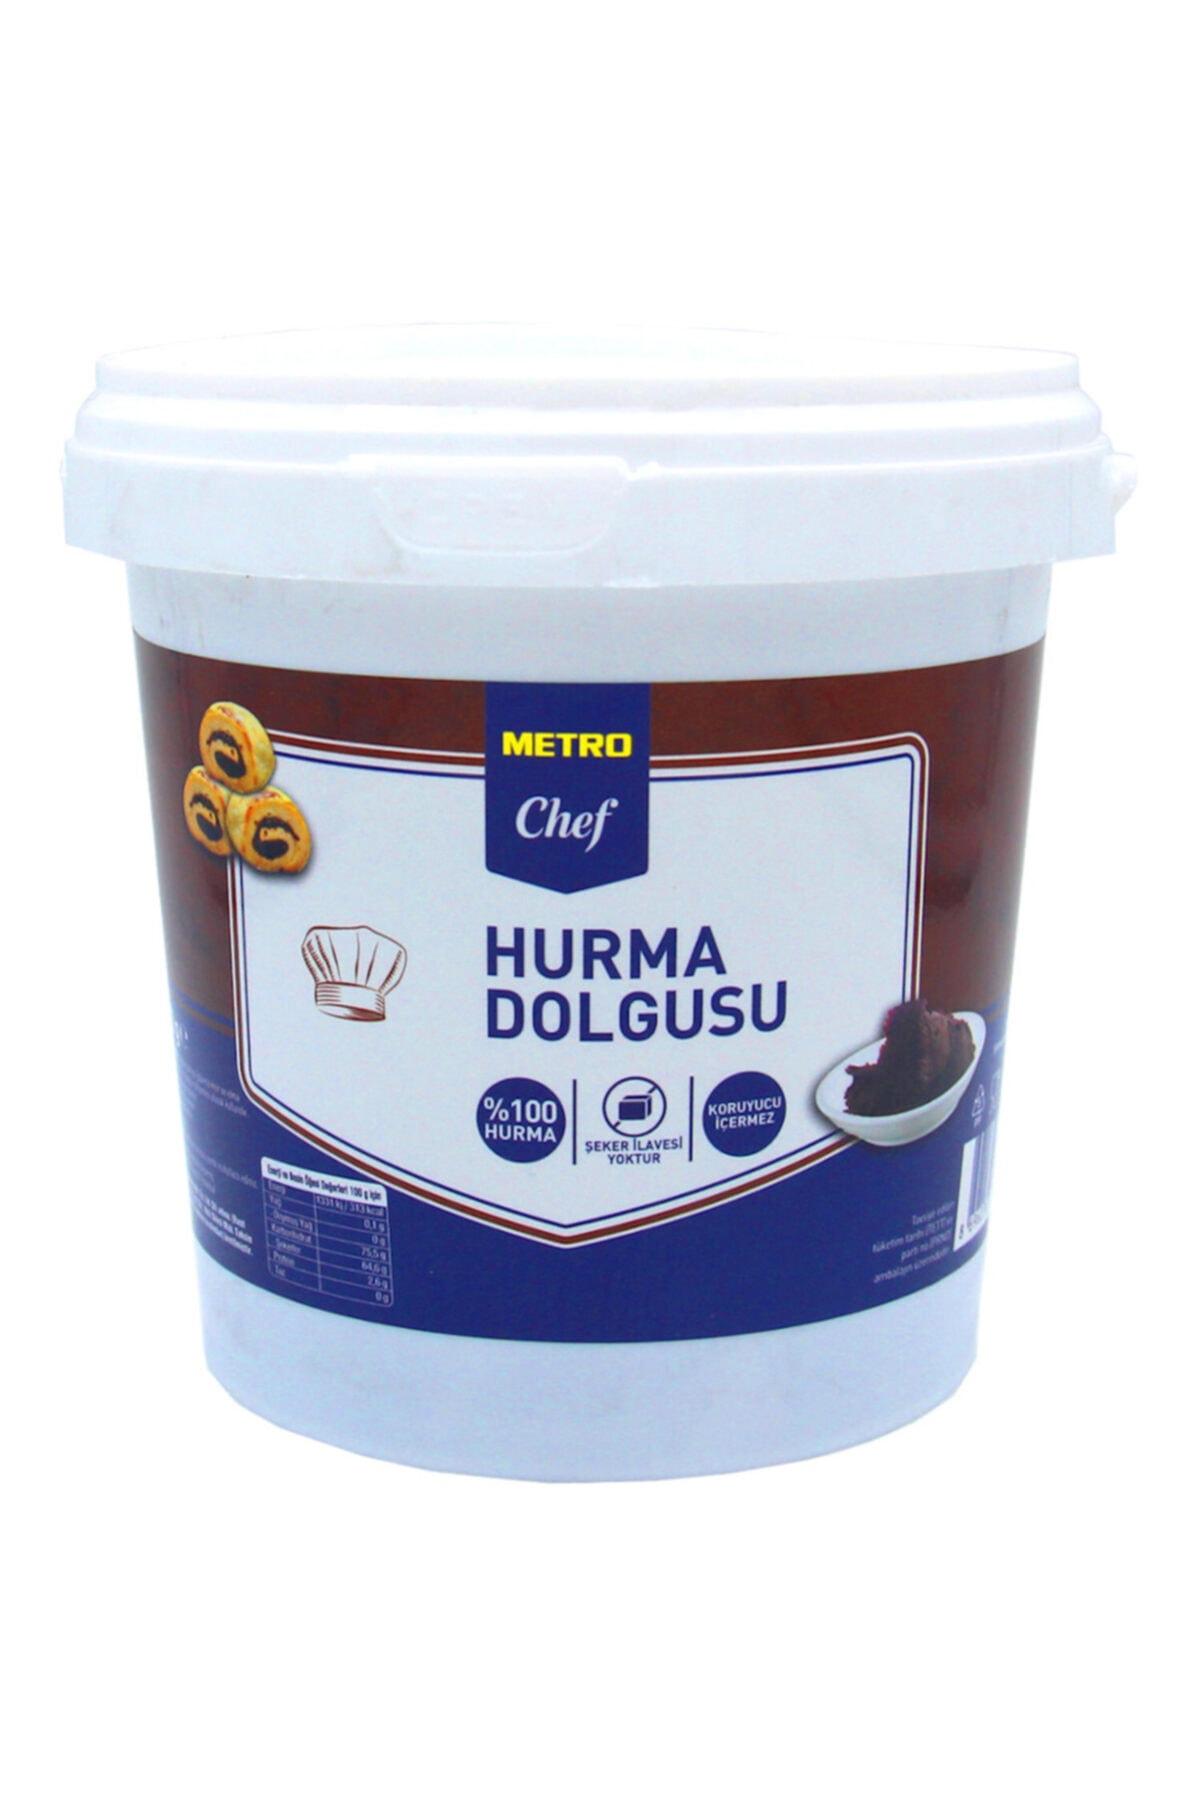 Elit parti Metro Chef Hurma Dolgusu (püresi) (1 Kg)